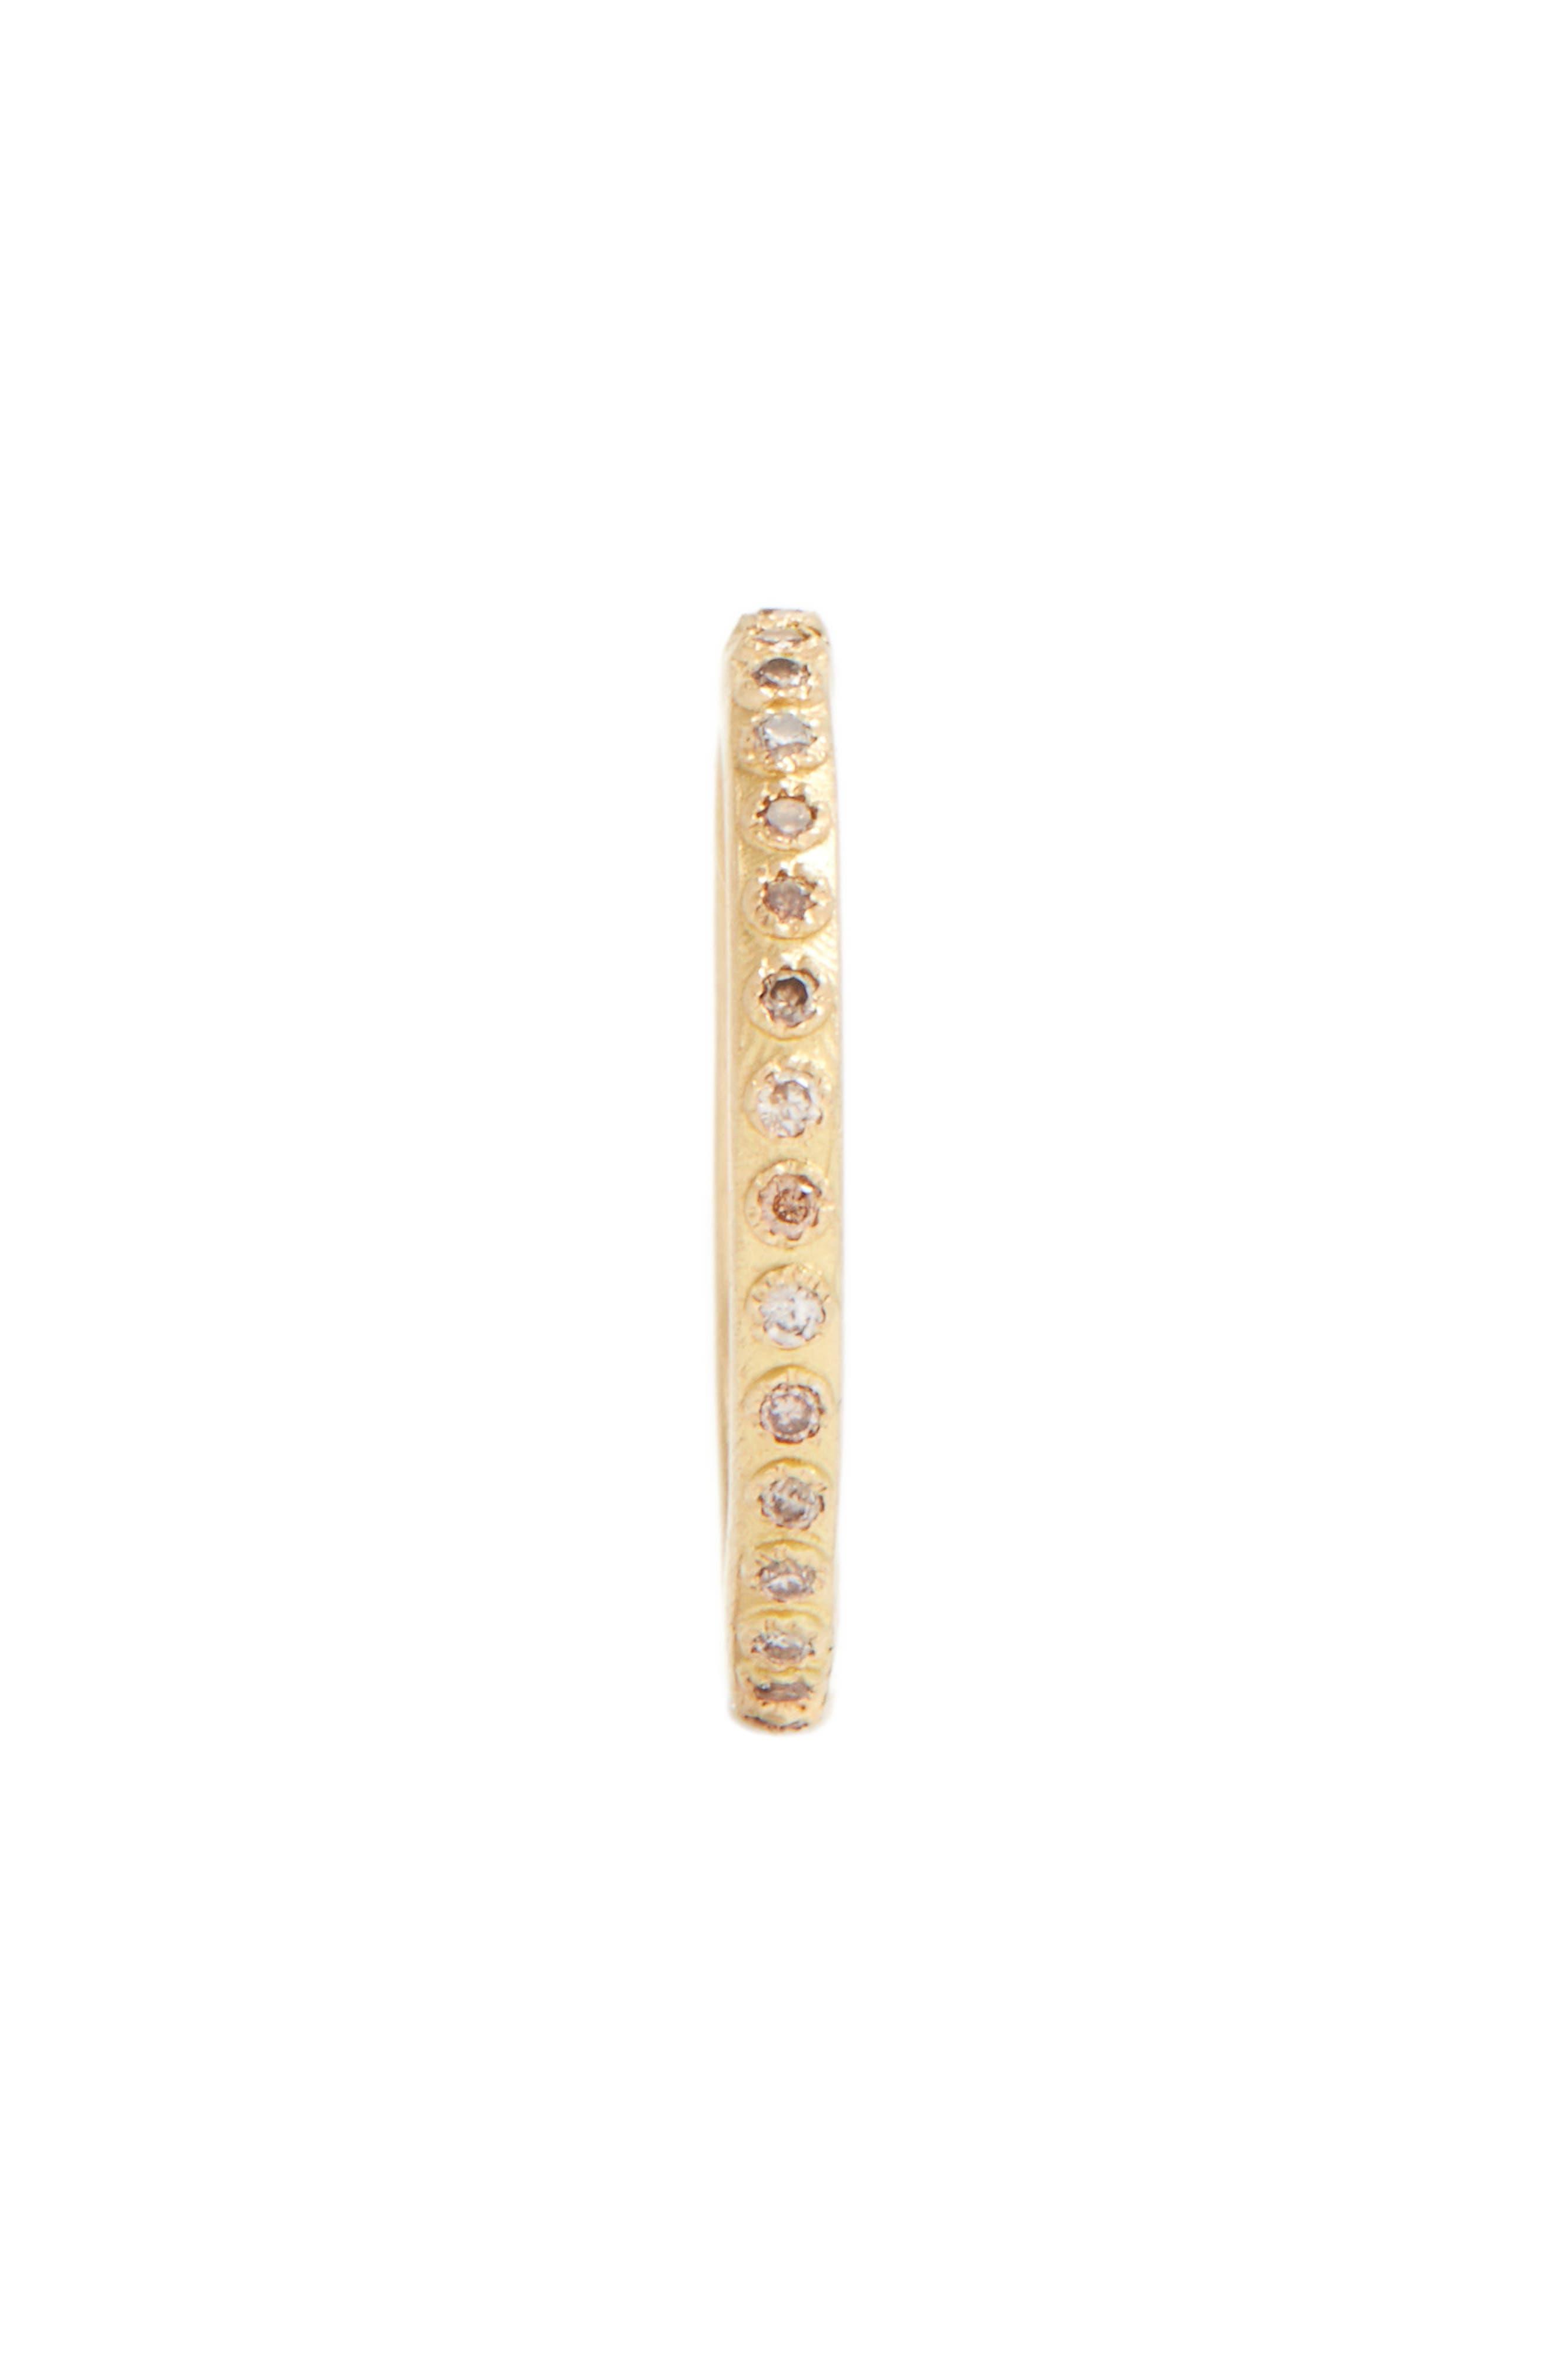 Sueño Champagne Diamond Band Ring,                             Alternate thumbnail 2, color,                             GOLD